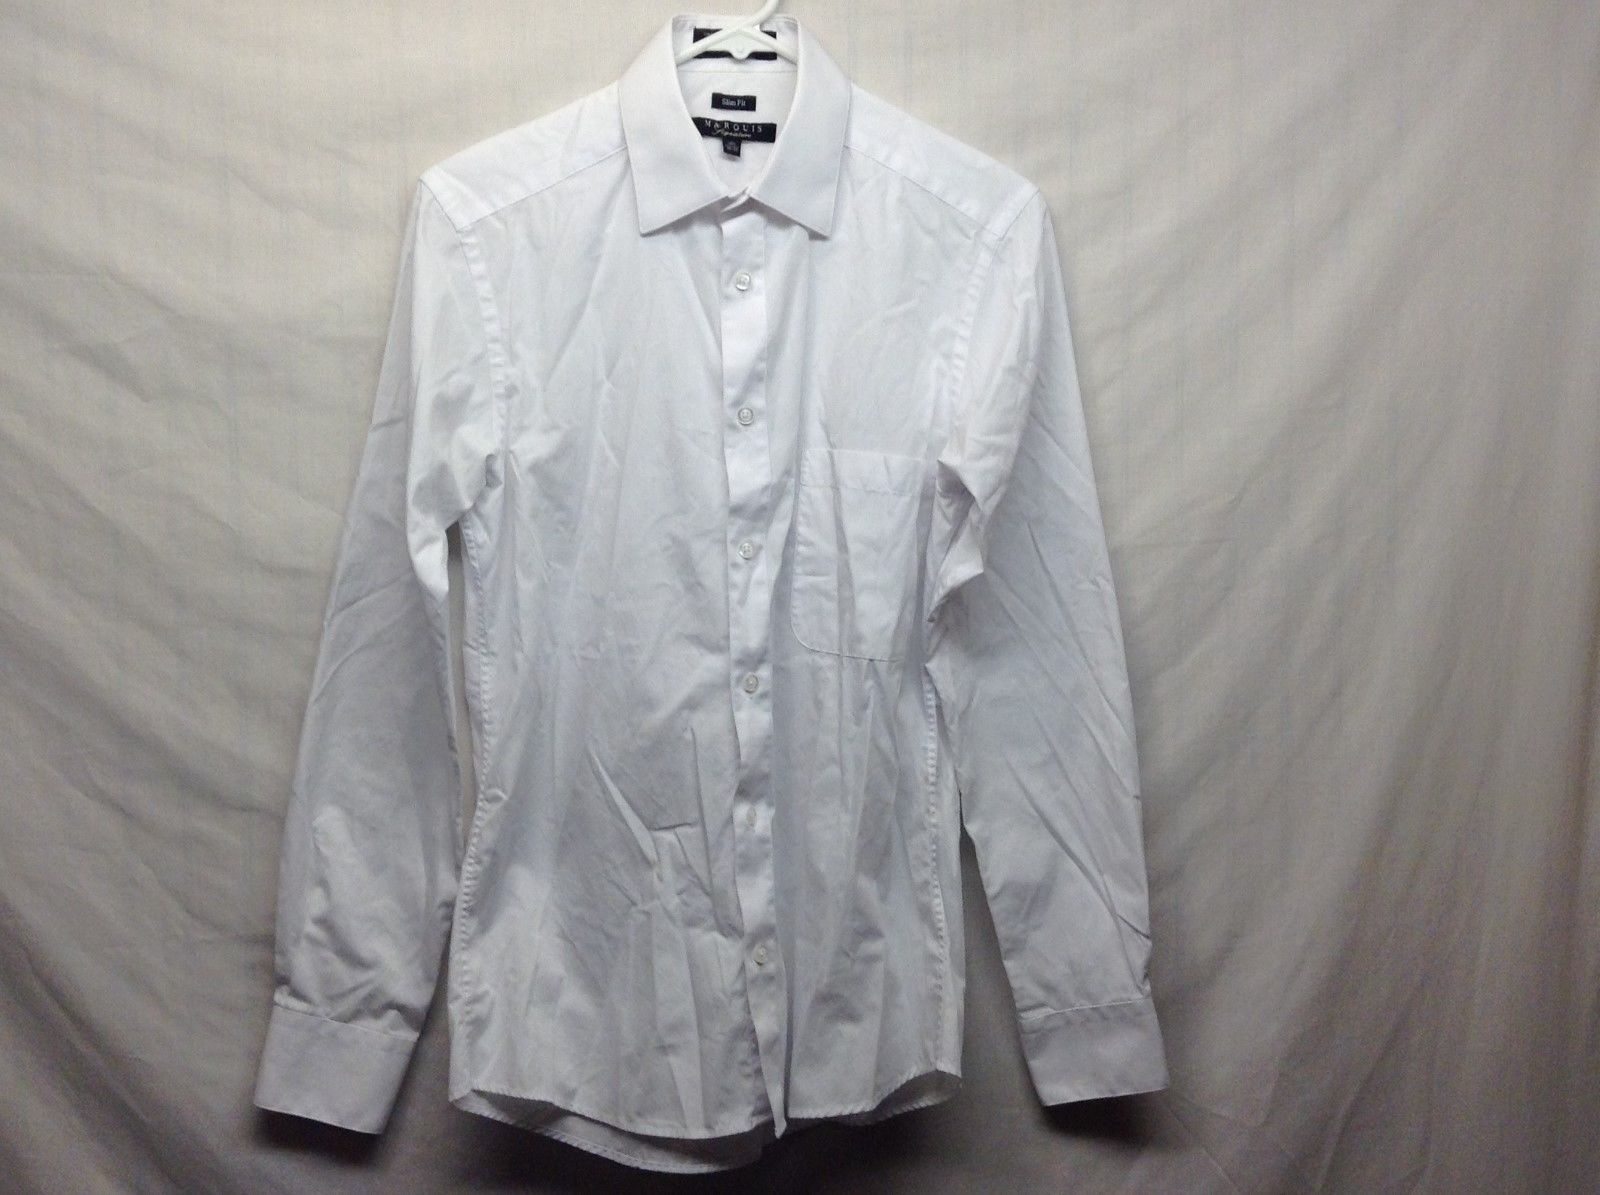 Marquis Signature Formal Wear Slim Fit Shirt Sz 14.5 32/33